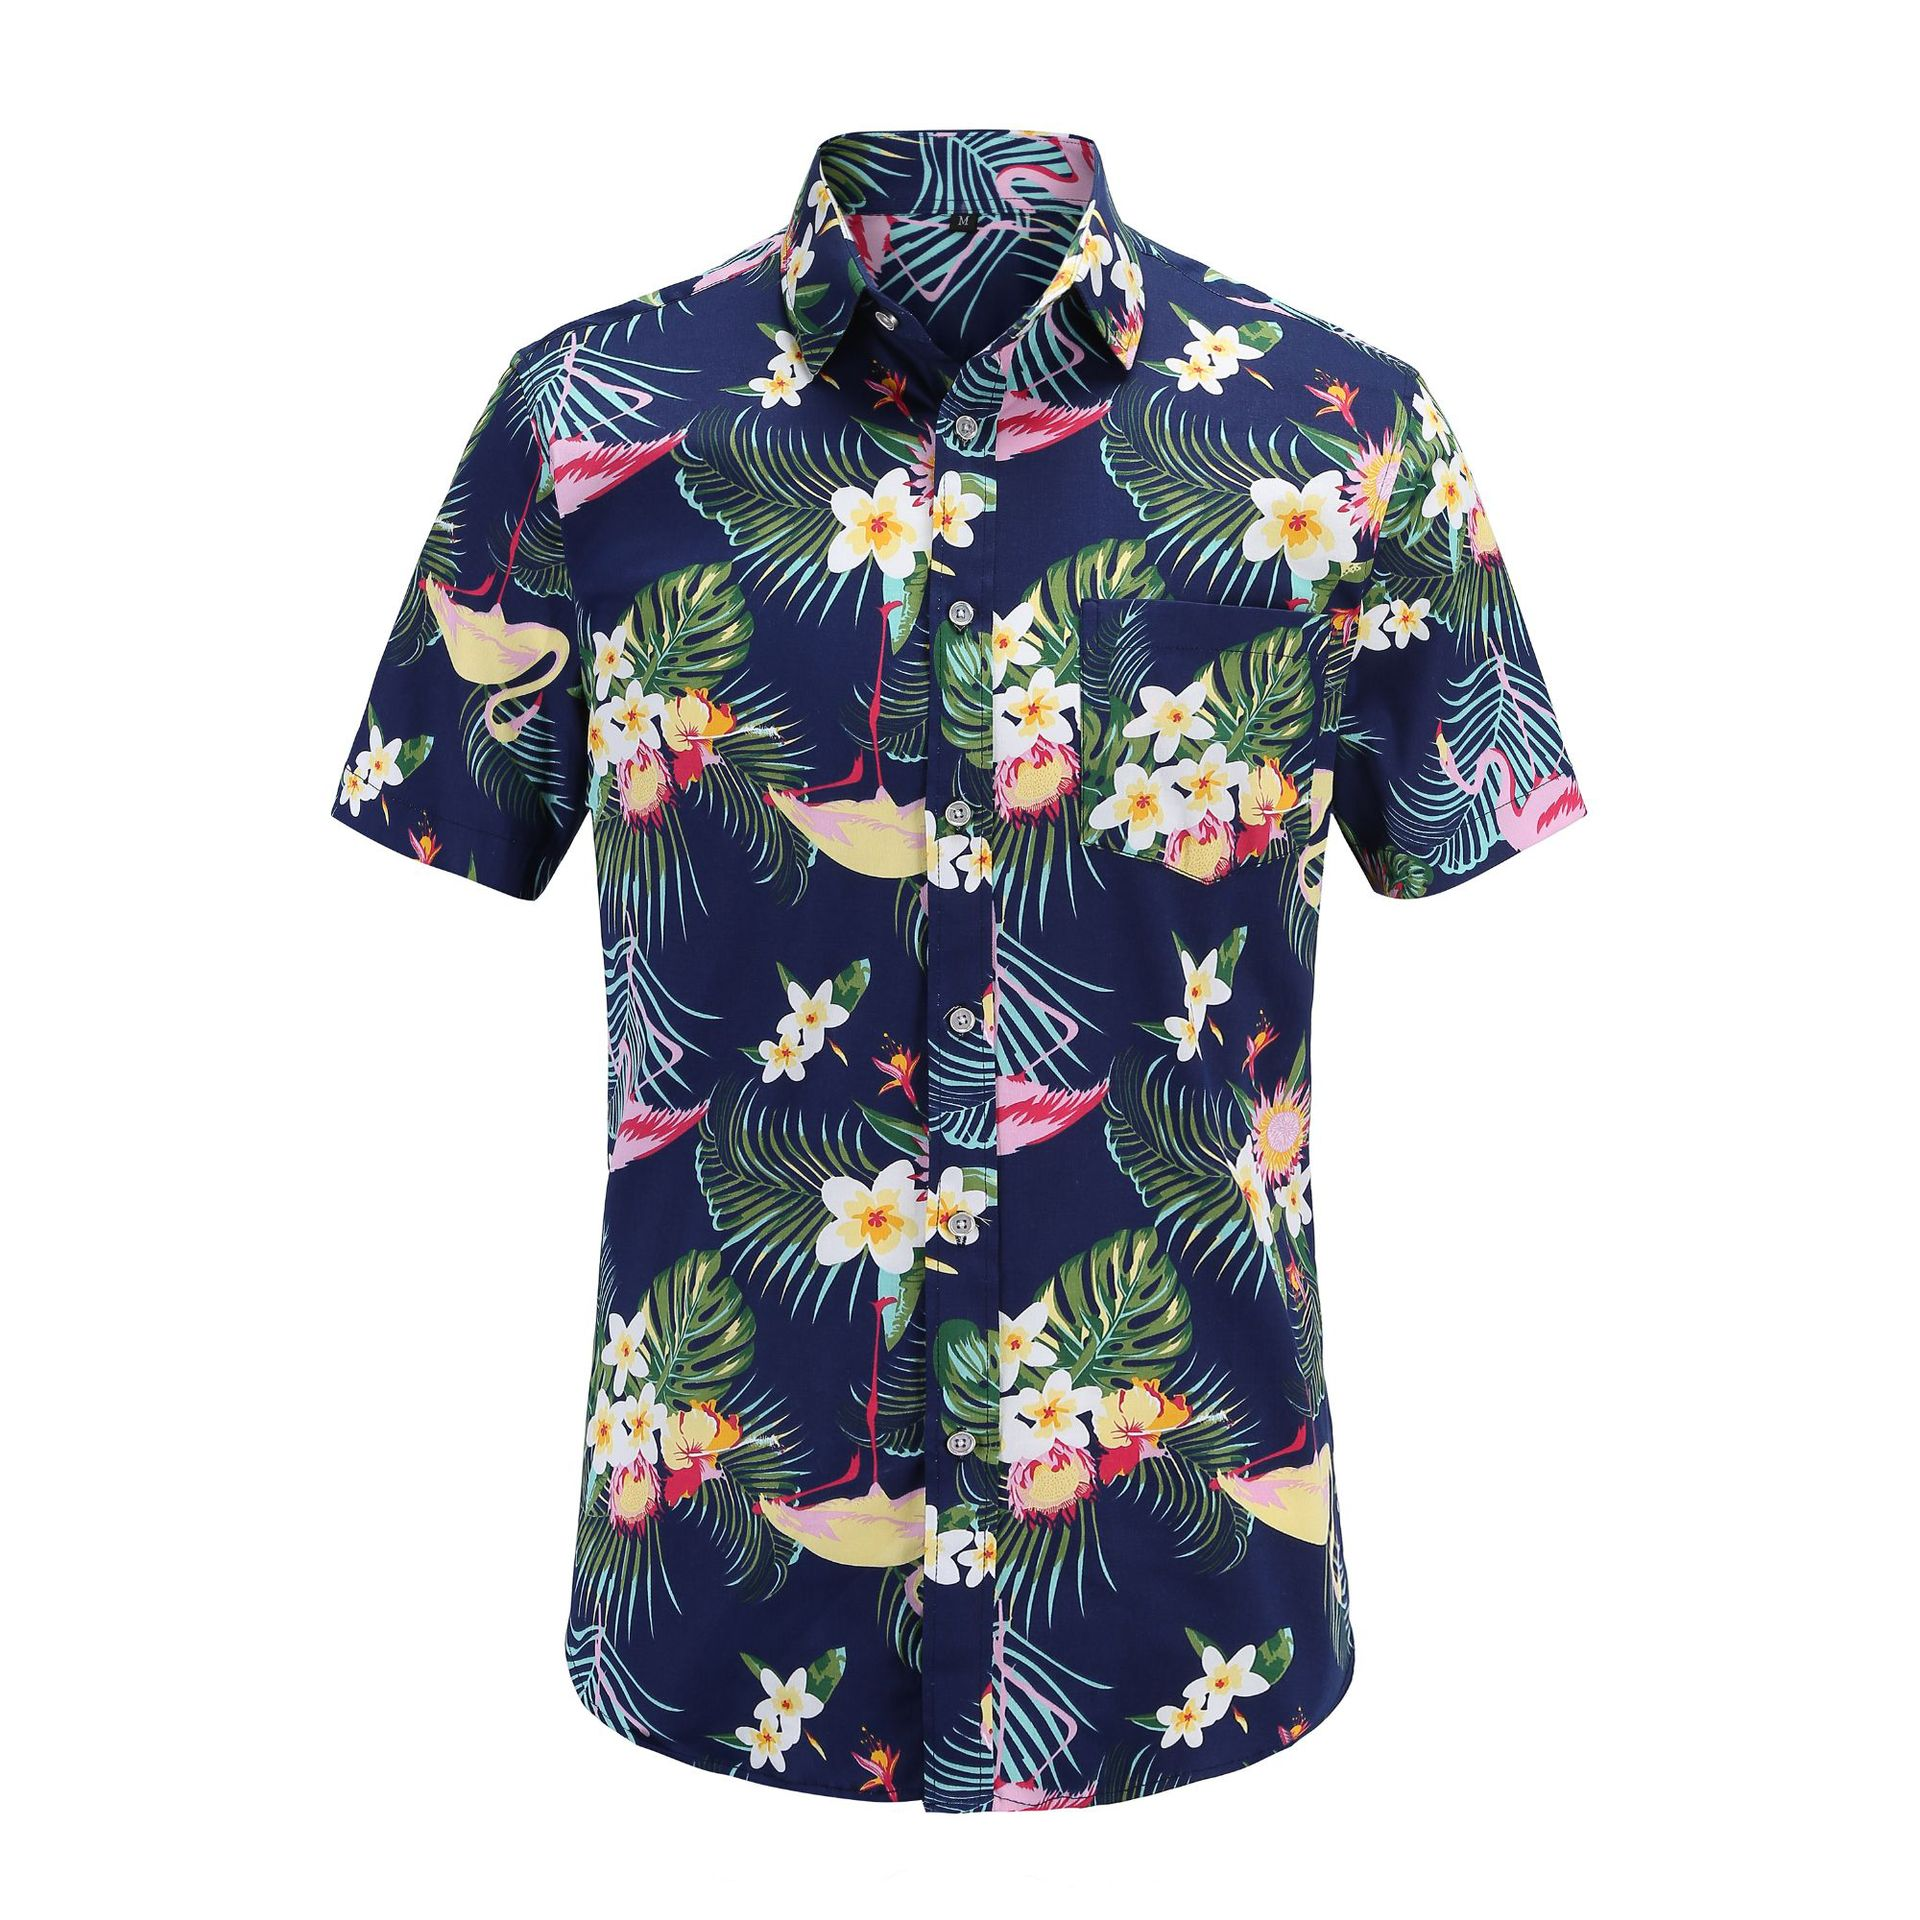 Fashion Mens Short Sleeve Shirt Beach Hawaiian Shirts Cotton Casual Floral Shirts Mens Clothing Plus Size in Casual Shirts from Men 39 s Clothing